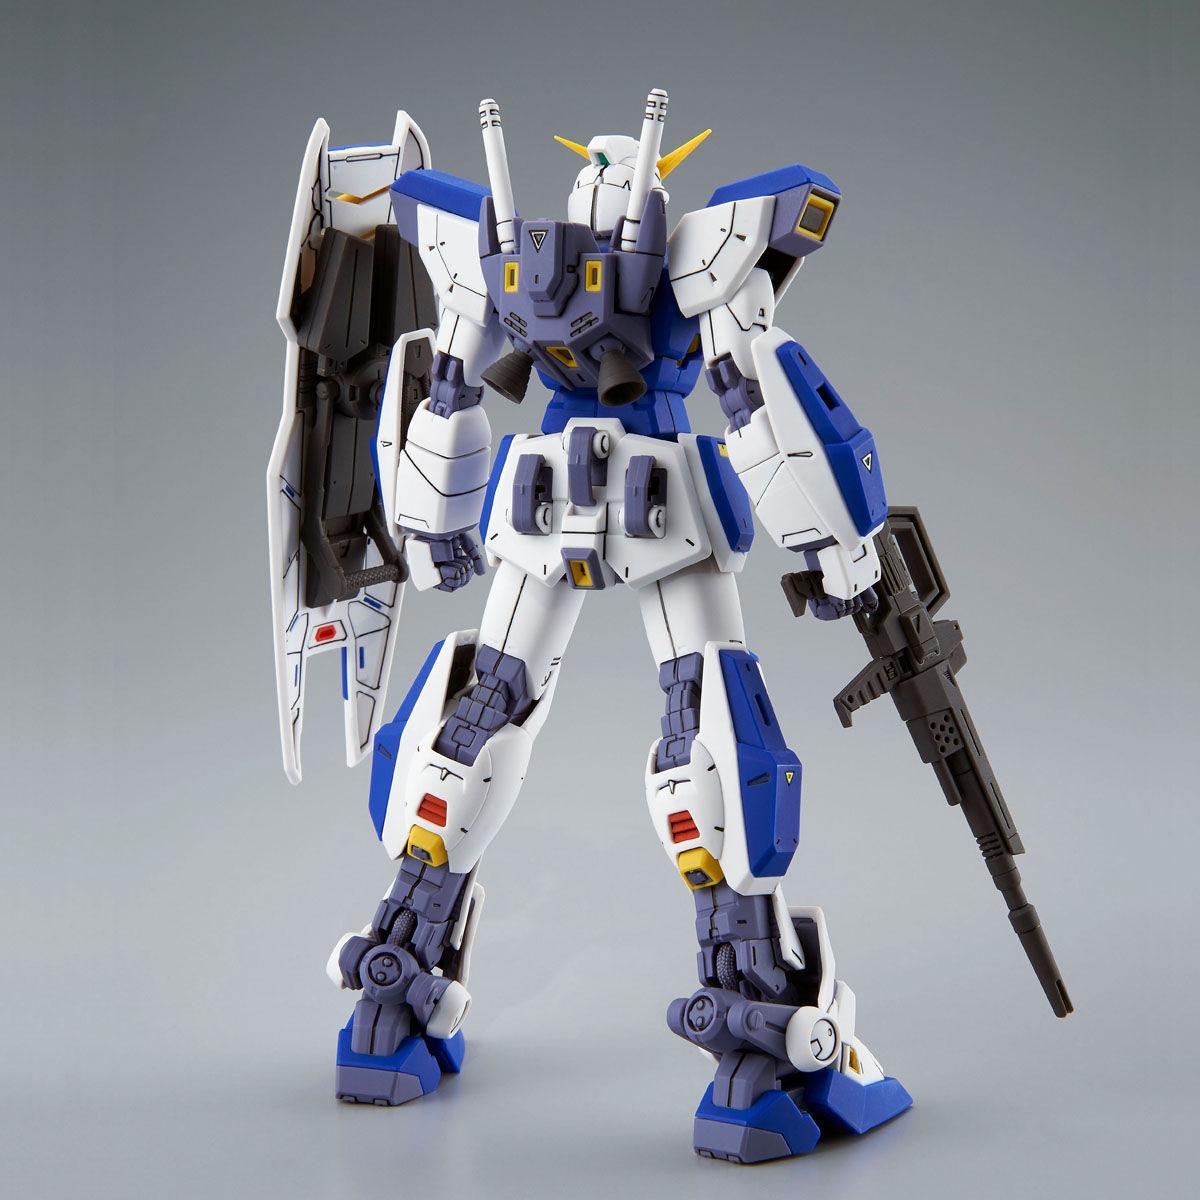 MG 1/100『ガンダムF90』プラモデル-003